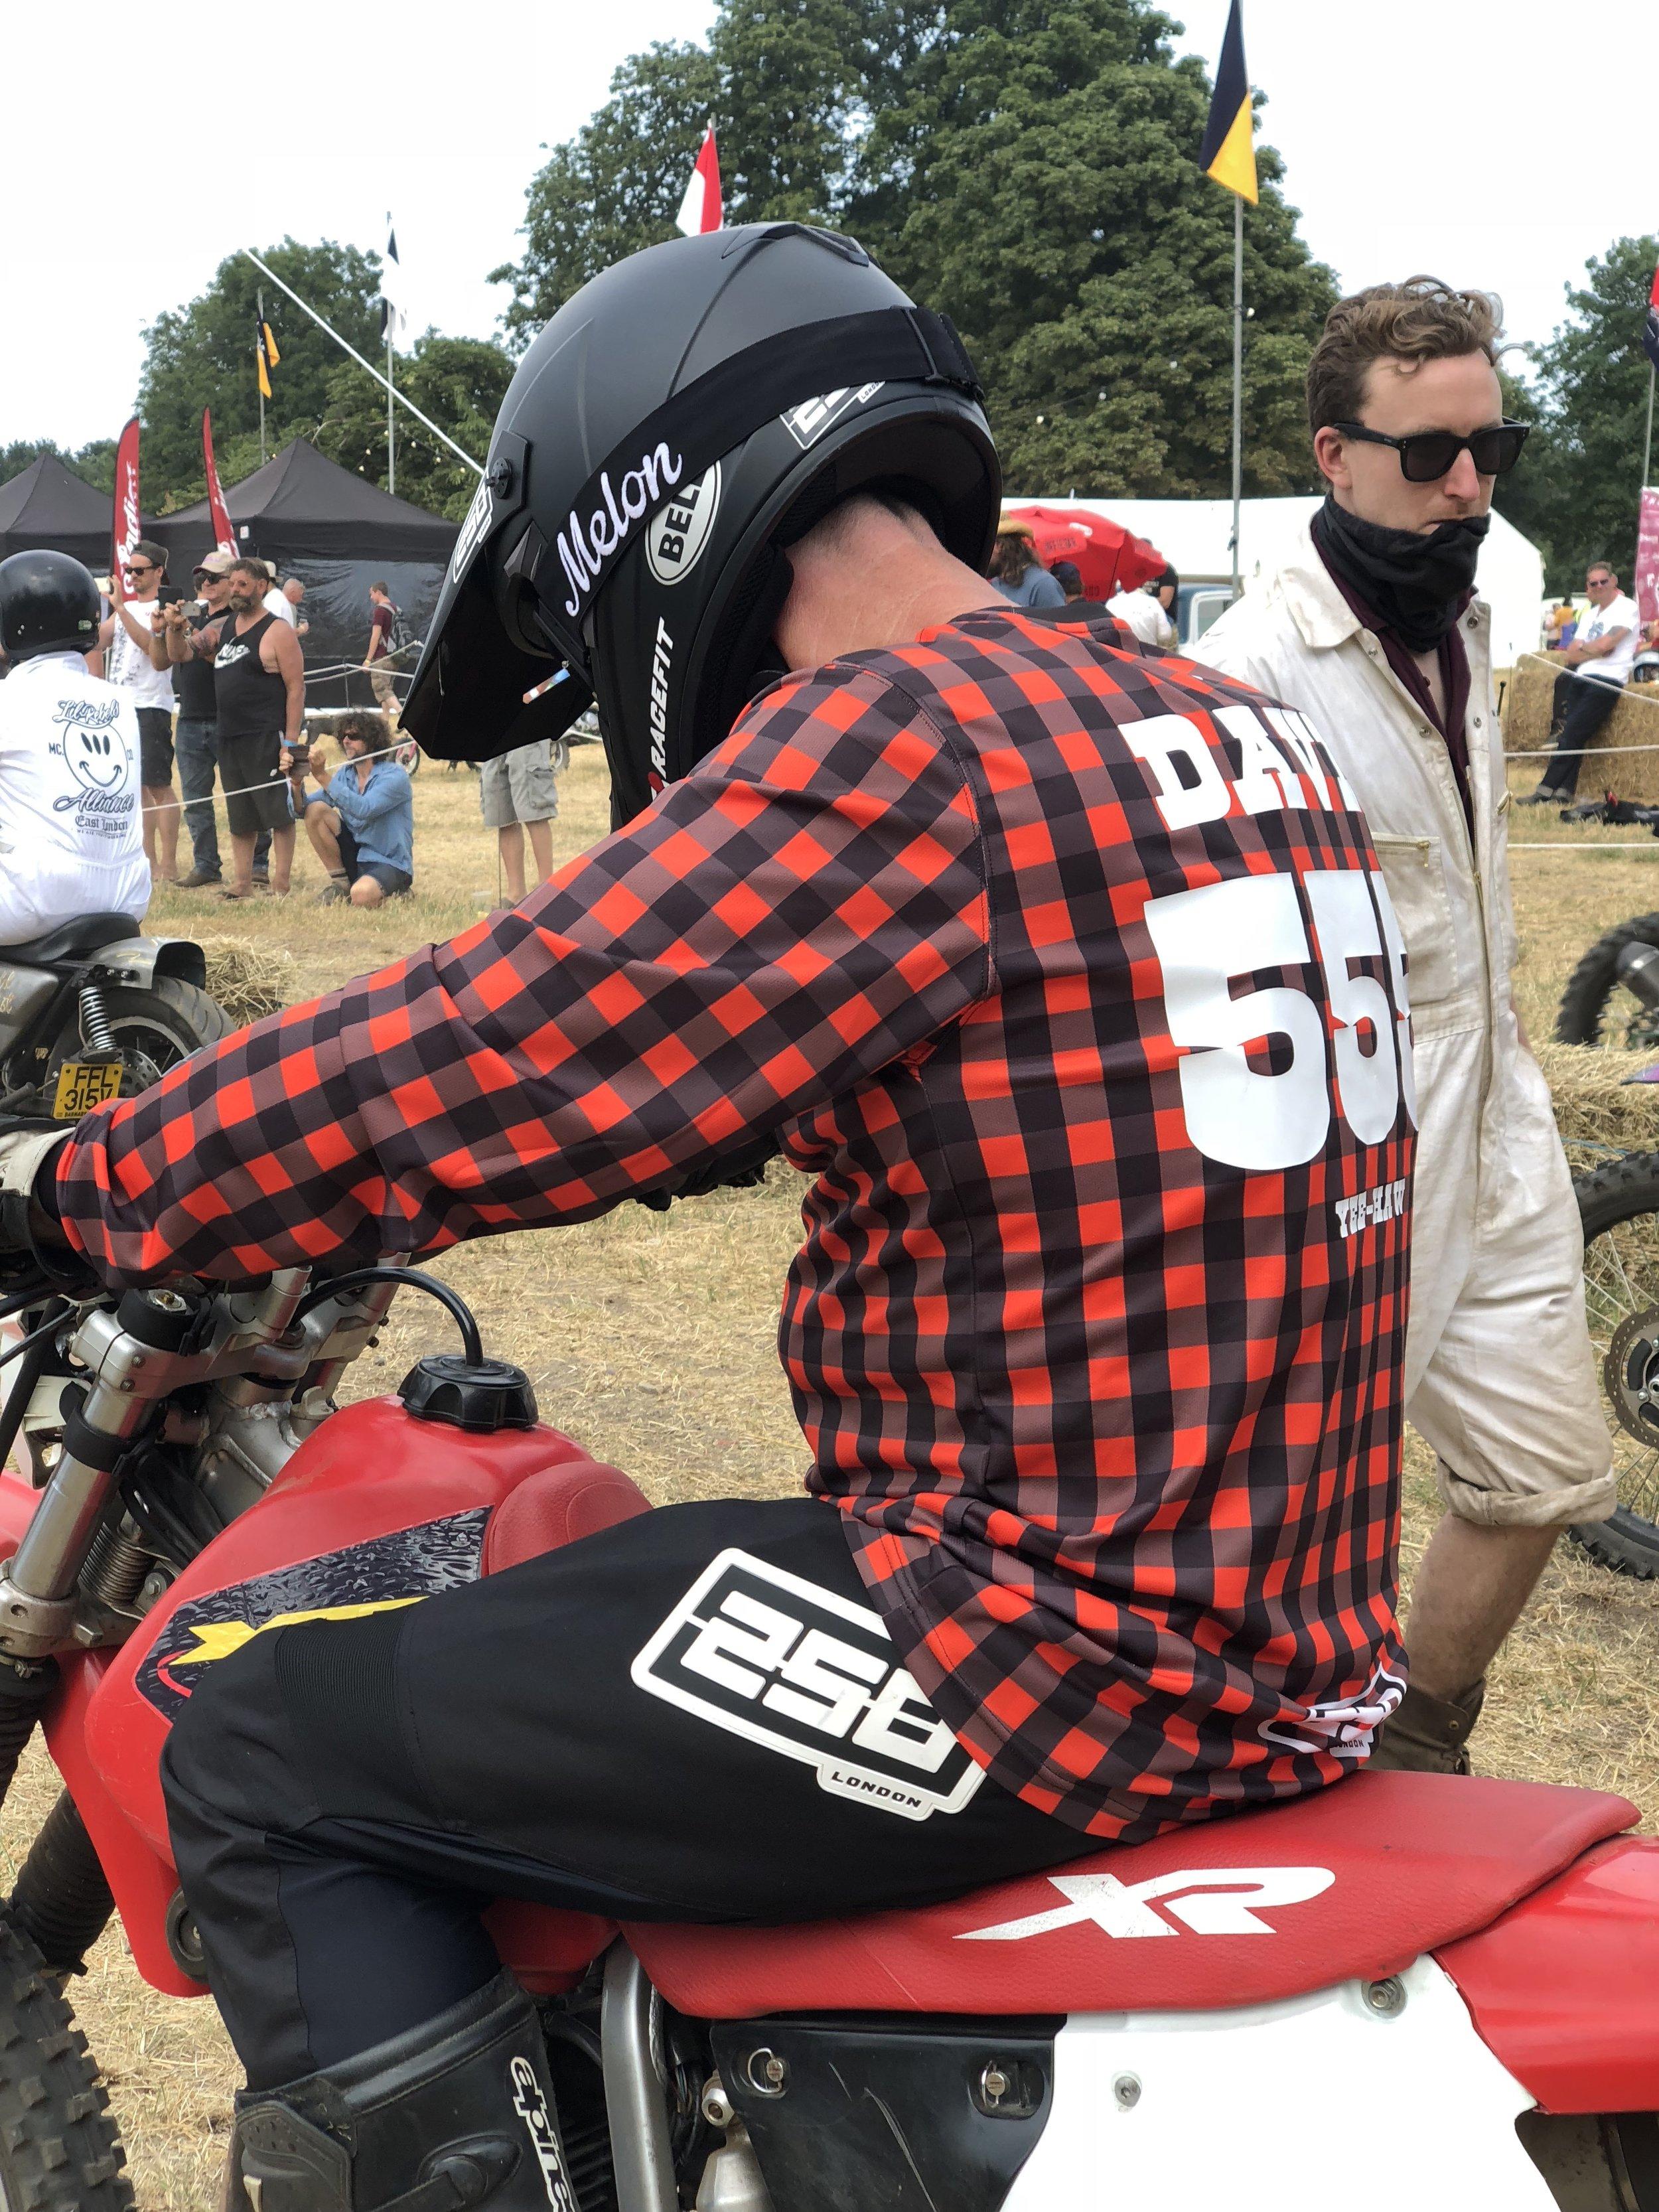 Tony gave the new 250 Moto Pants a ride for their money Image: Beatriz Celdrán Subiela